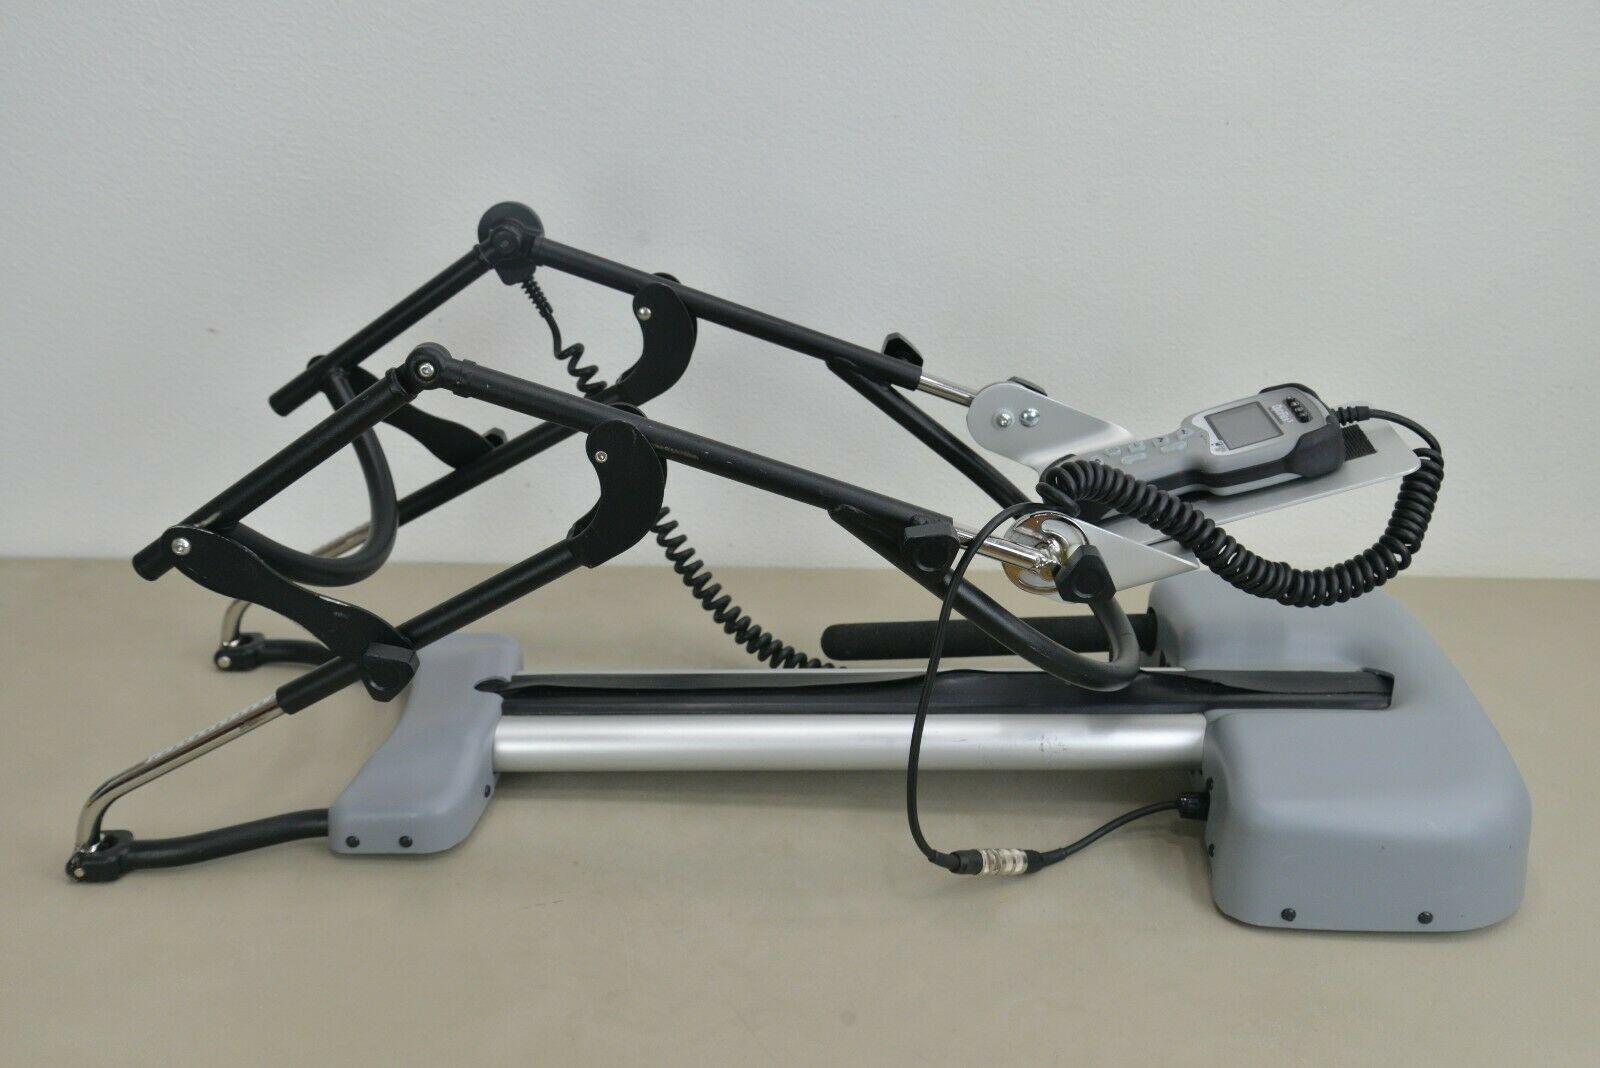 Chattanooga OptiFlex 3 Knee CPM Model 2090 (23205) - Rhino ...